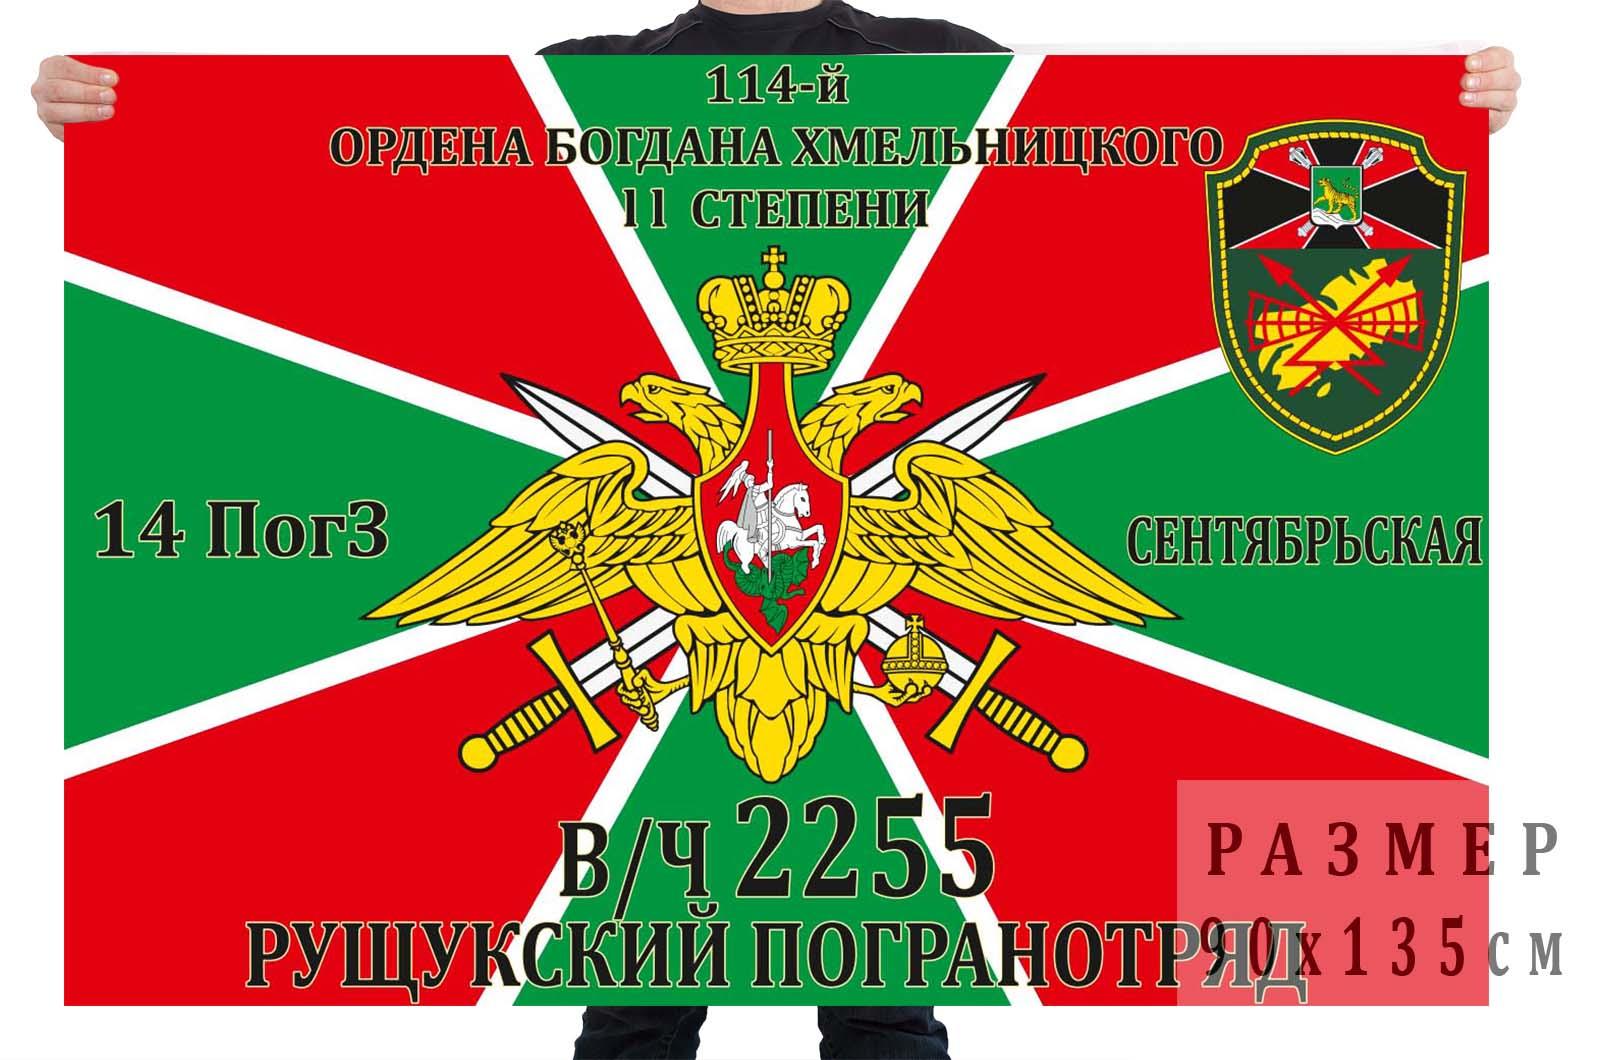 Флаг 14 ПогЗ 114 Рущукского погранотряда